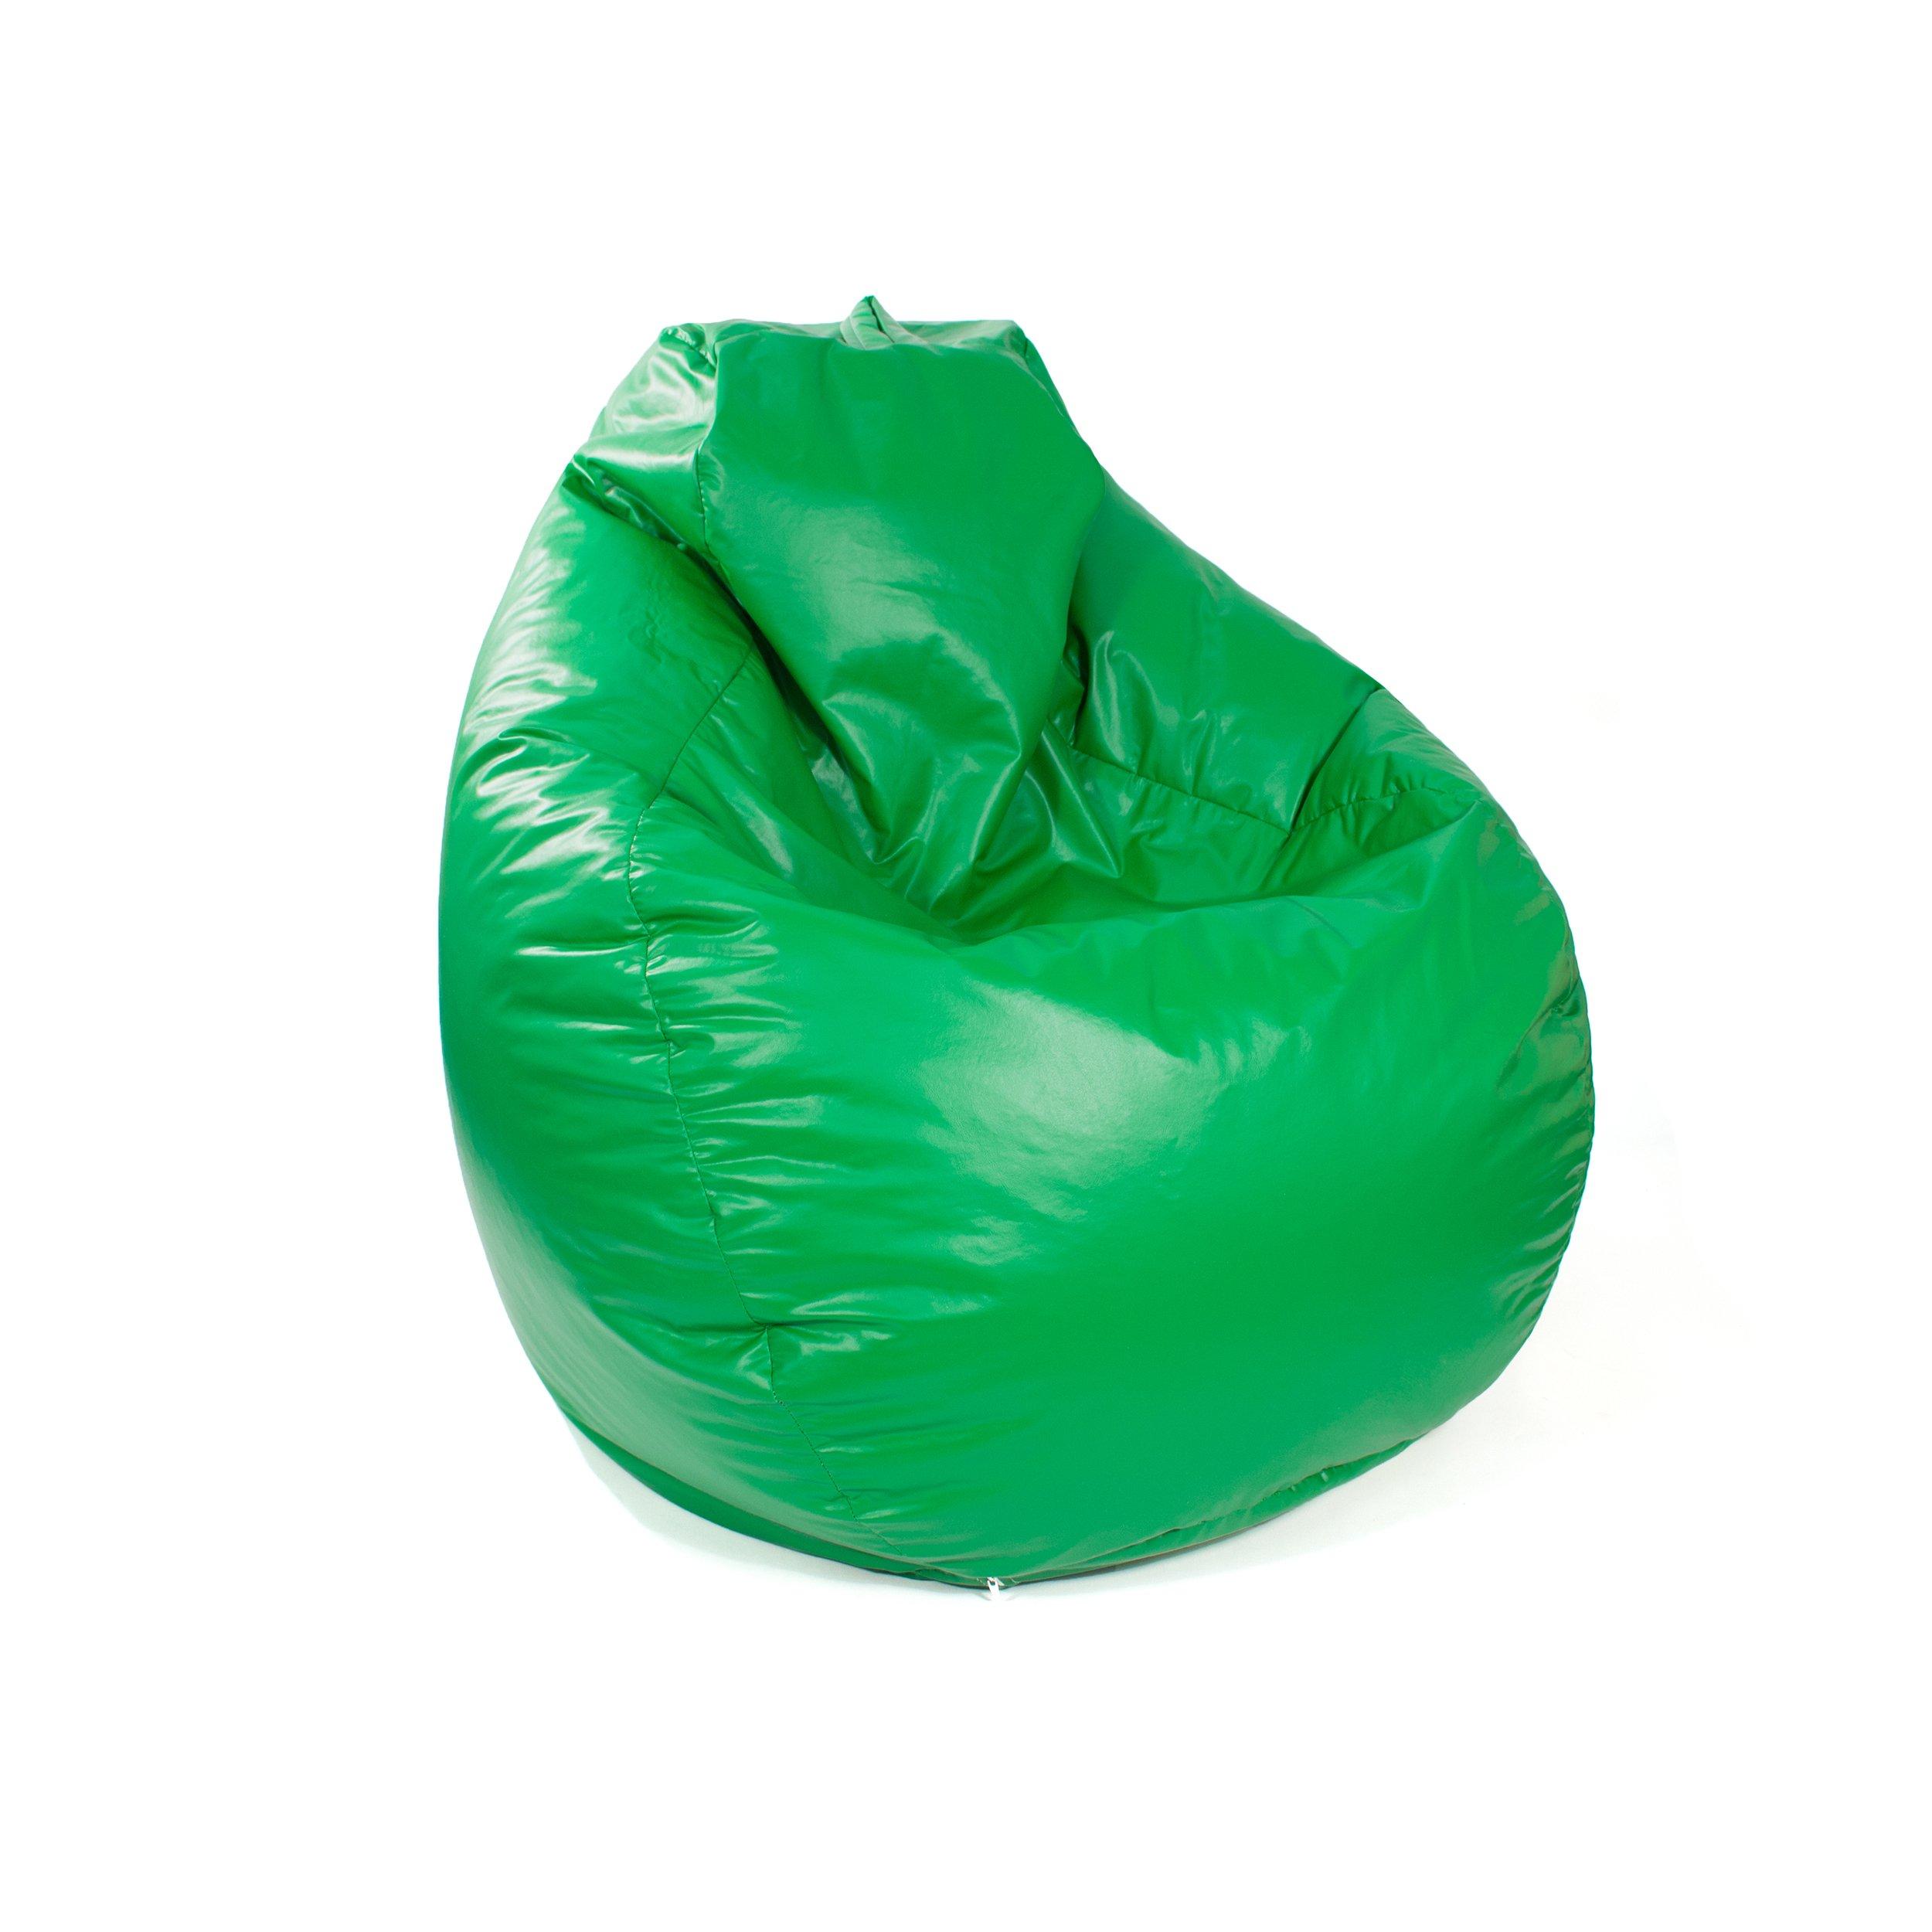 Gold Medal Bean Bags Tear Drop Leather Look Vinyl Bean Bag, Large, Green